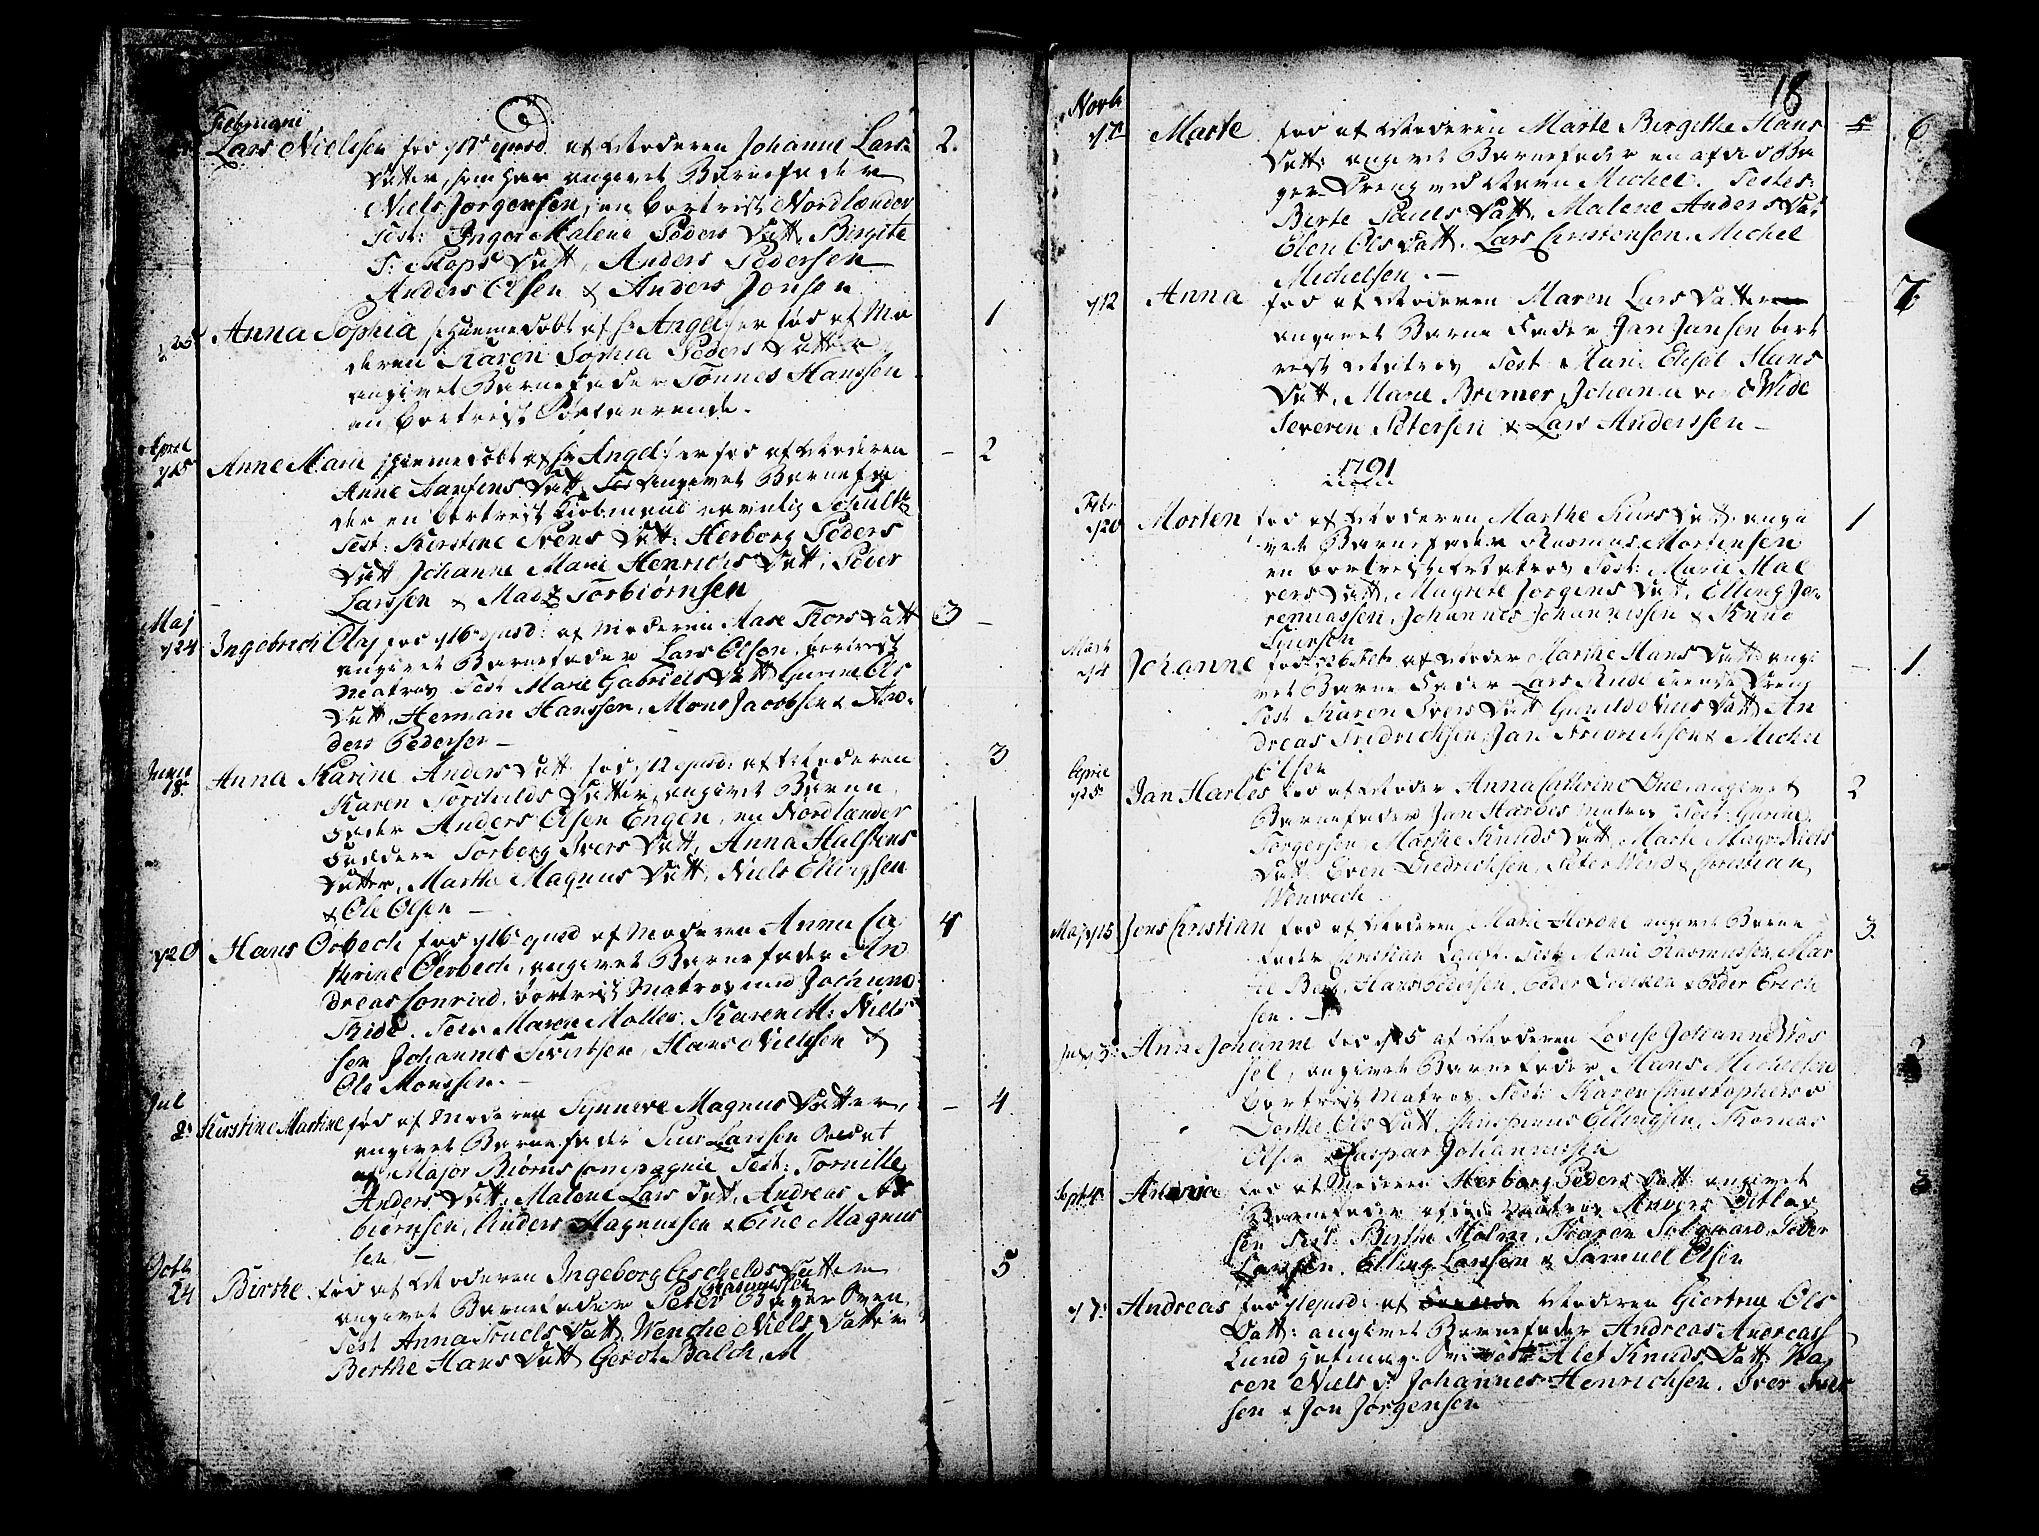 SAB, Domkirken Sokneprestembete, H/Haa/L0003: Ministerialbok nr. A 3, 1758-1789, s. 18